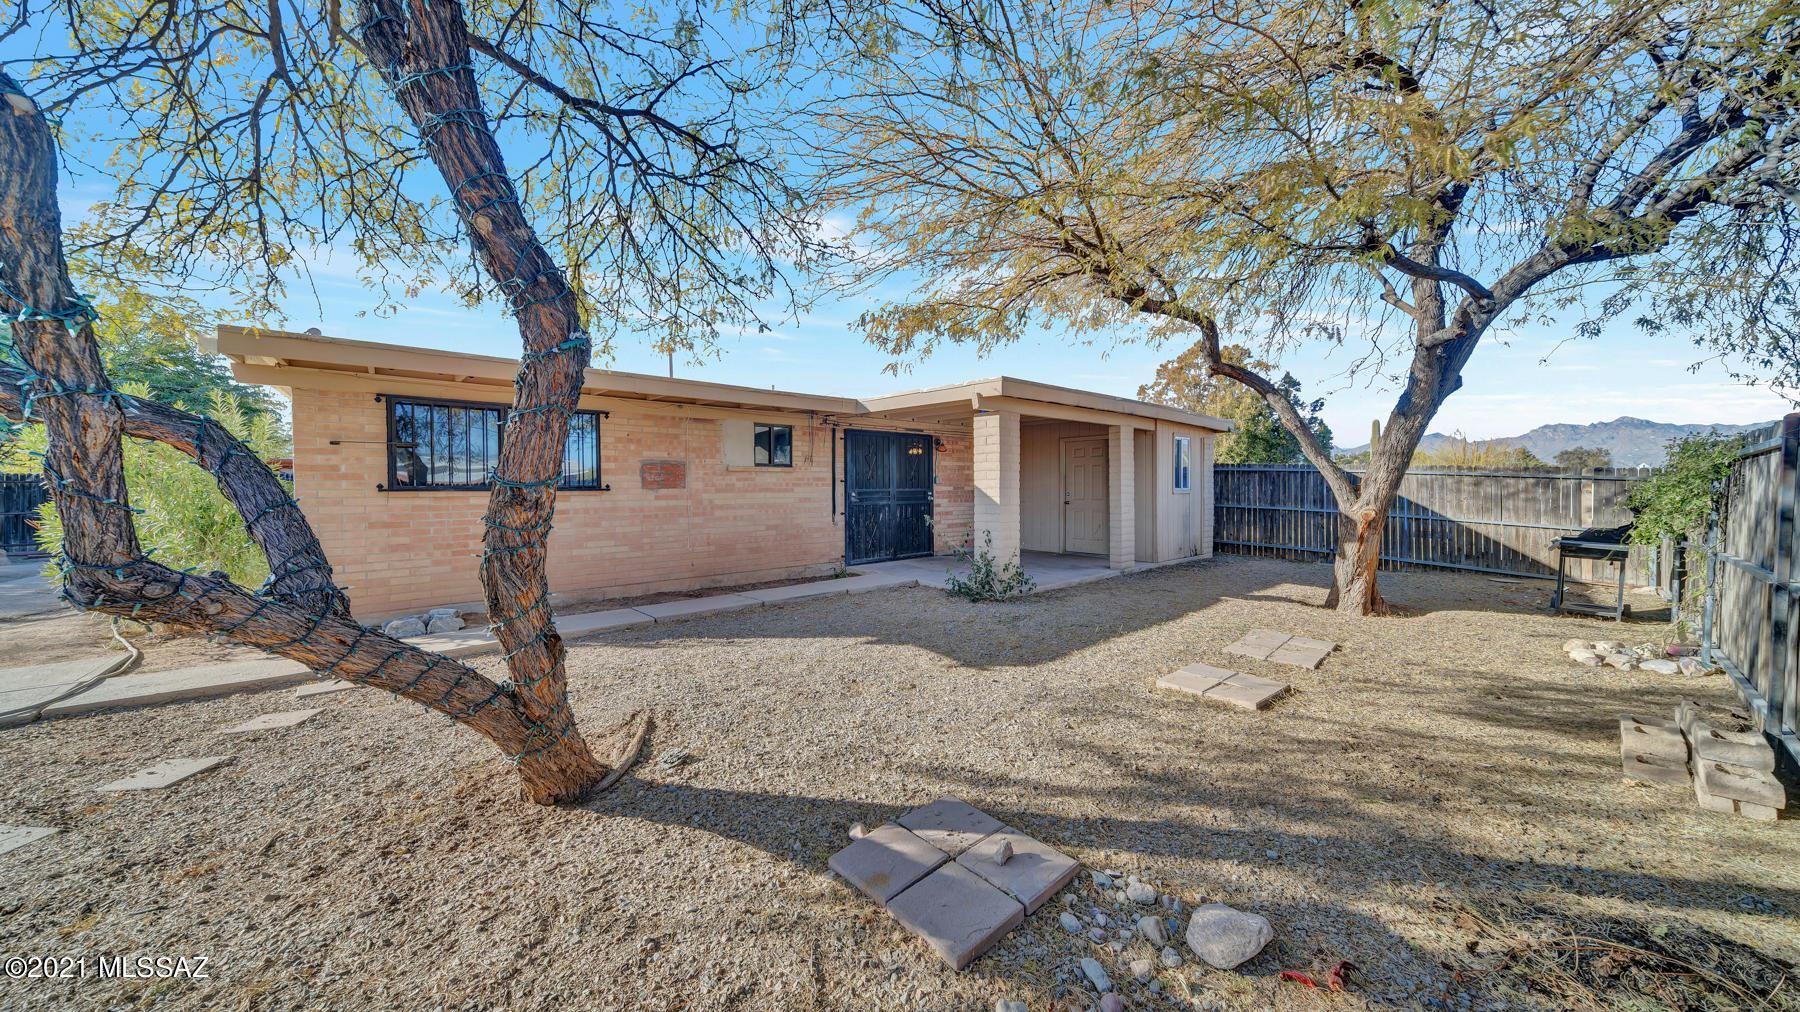 6664 E Nelson Drive, Tucson, AZ 85730 - MLS#: 22101320